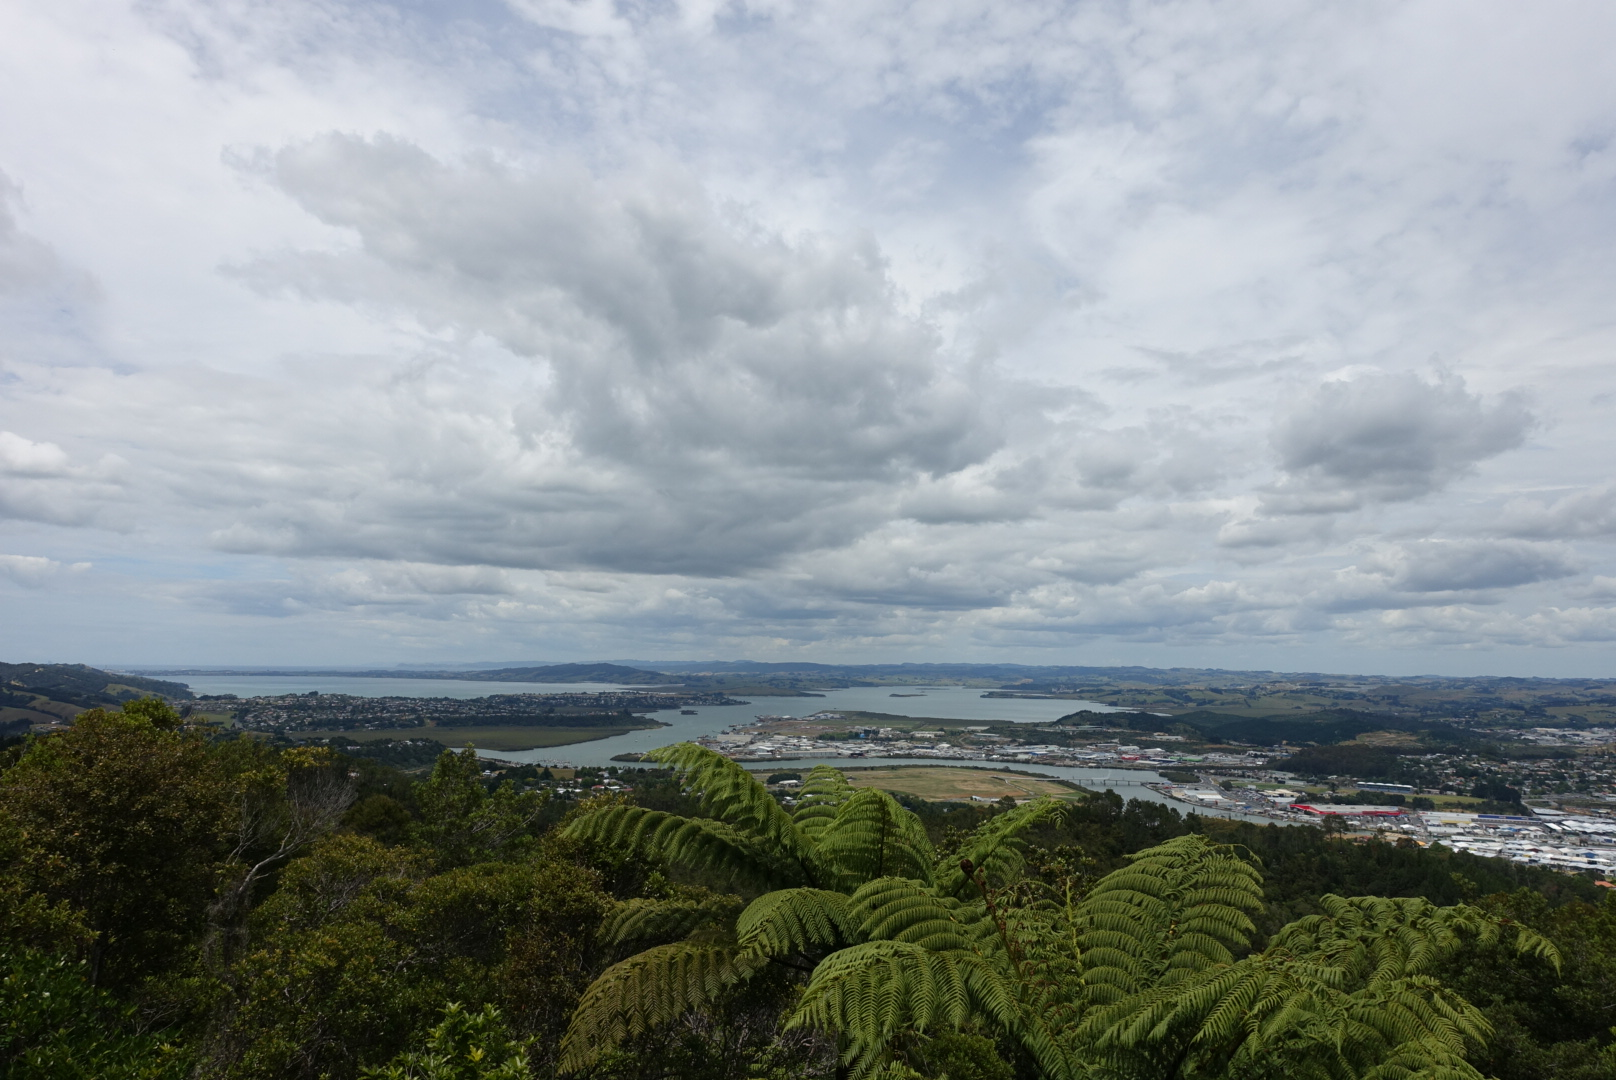 At the summit of Mount Parihaka looking down into Whangarei